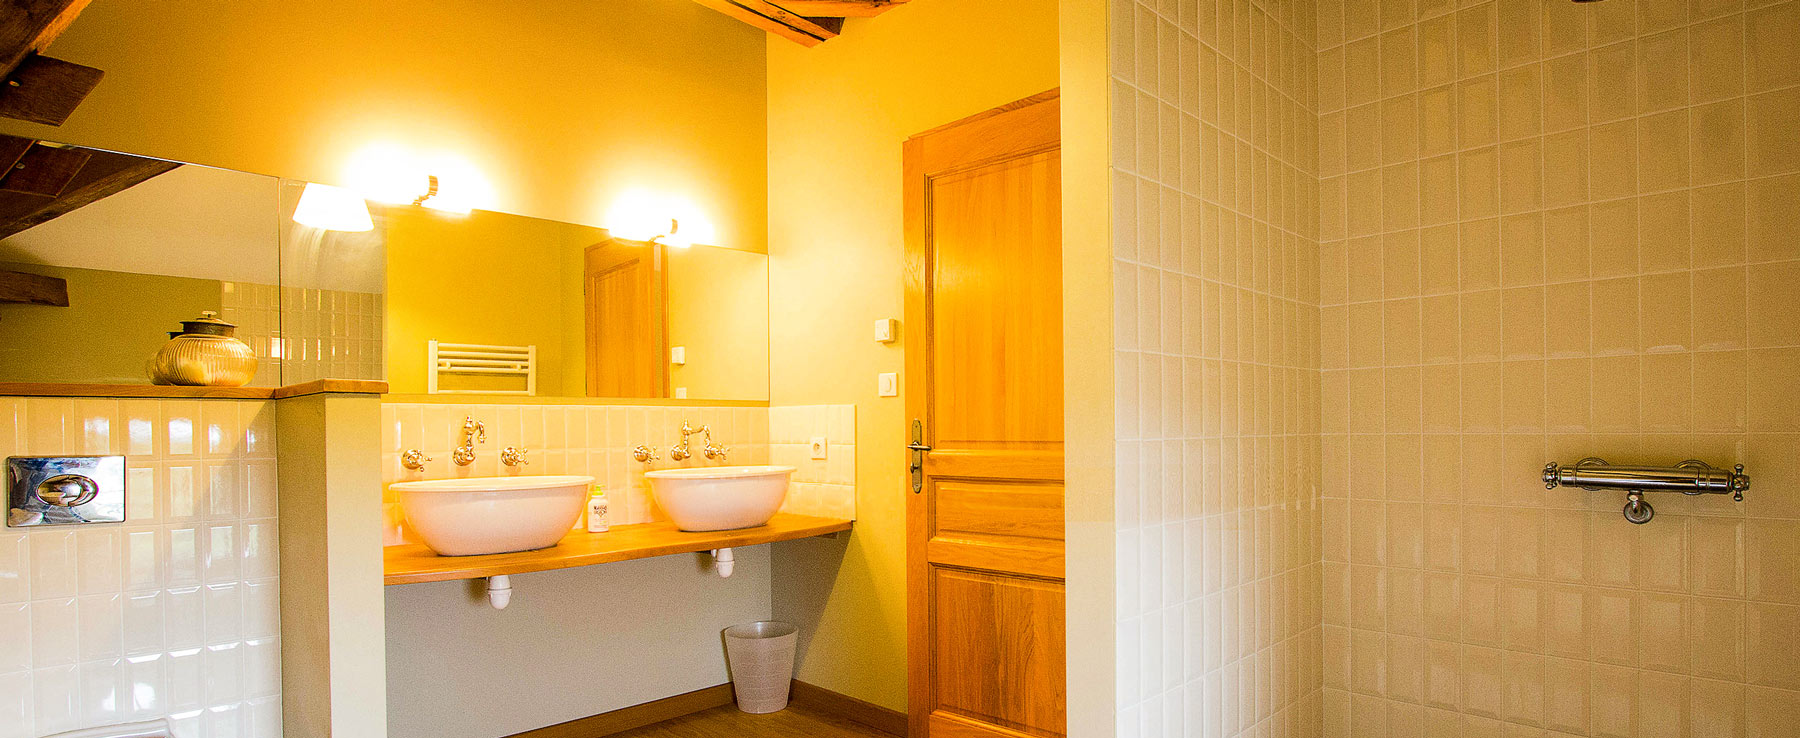 Bedroom_2_shower_and_wc_Joli_Fleuron_France